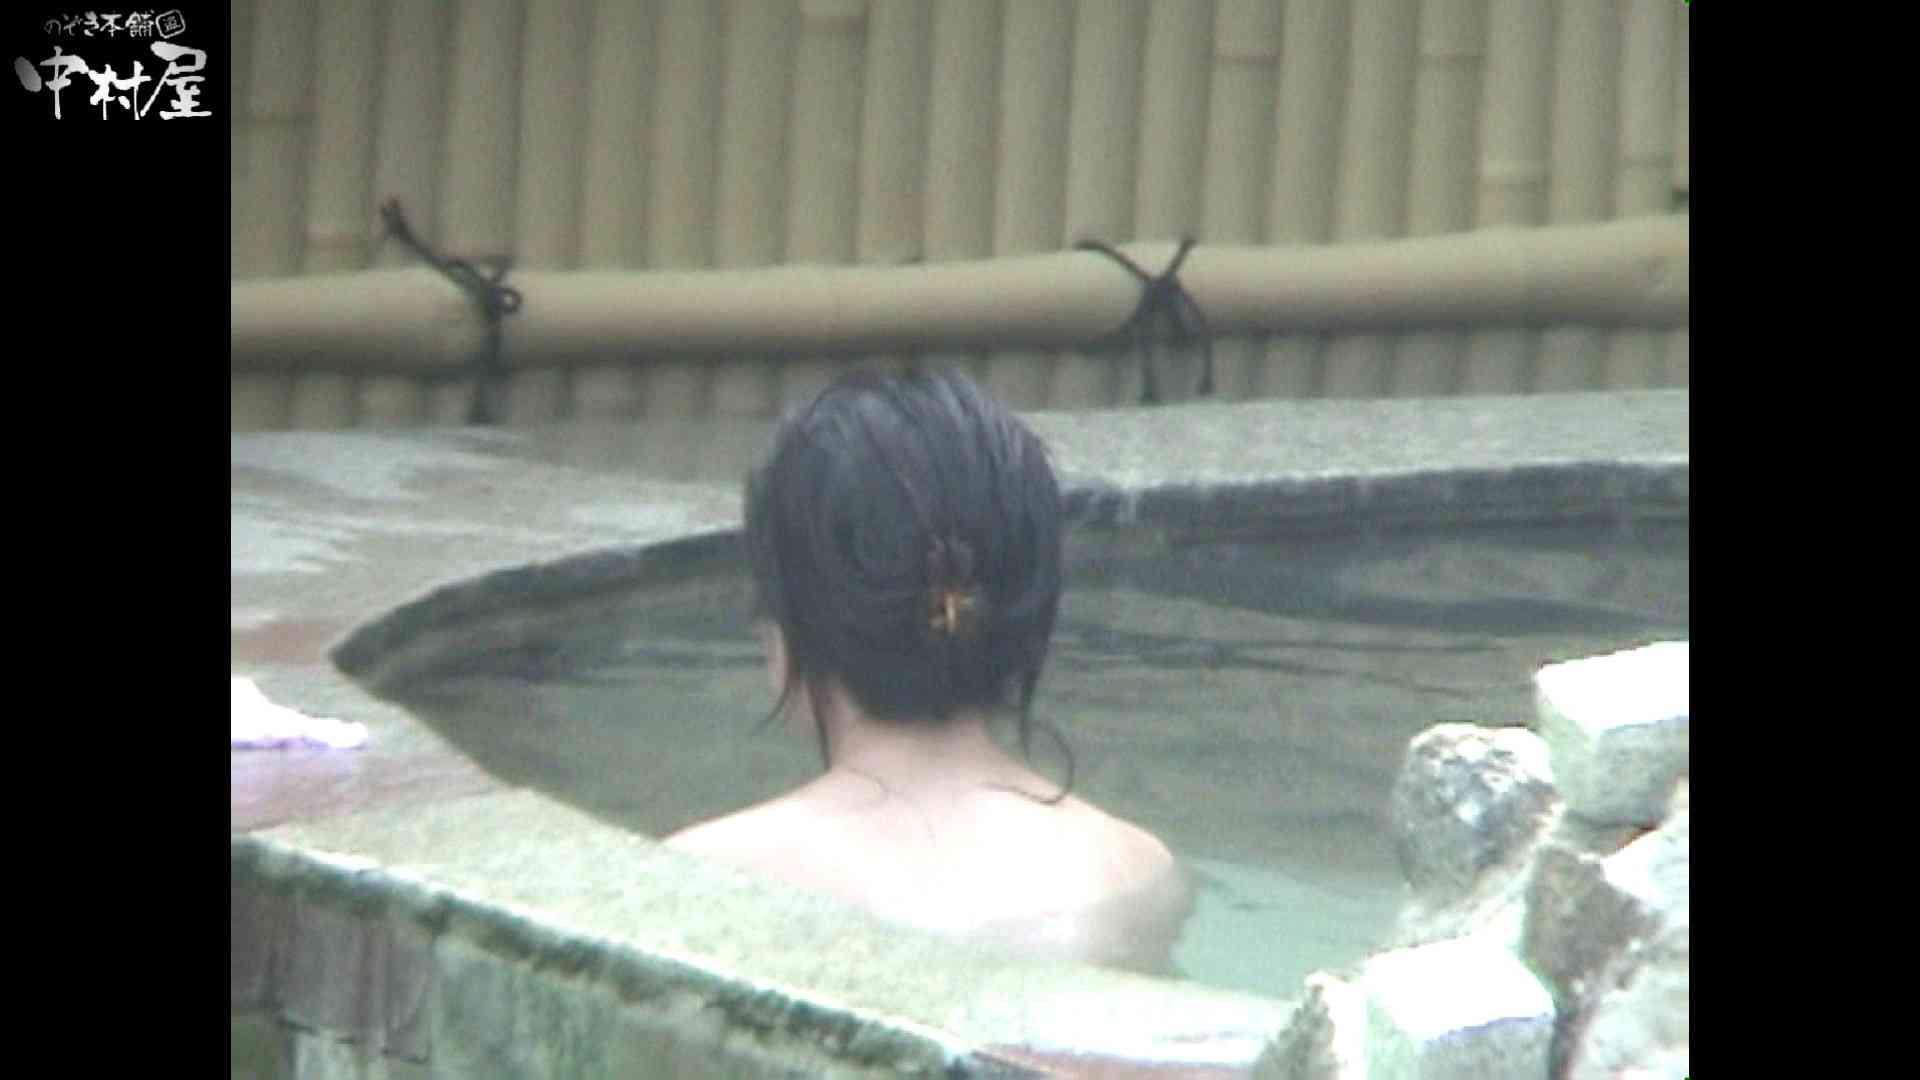 Aquaな露天風呂Vol.936 OLセックス 覗きぱこり動画紹介 75画像 8